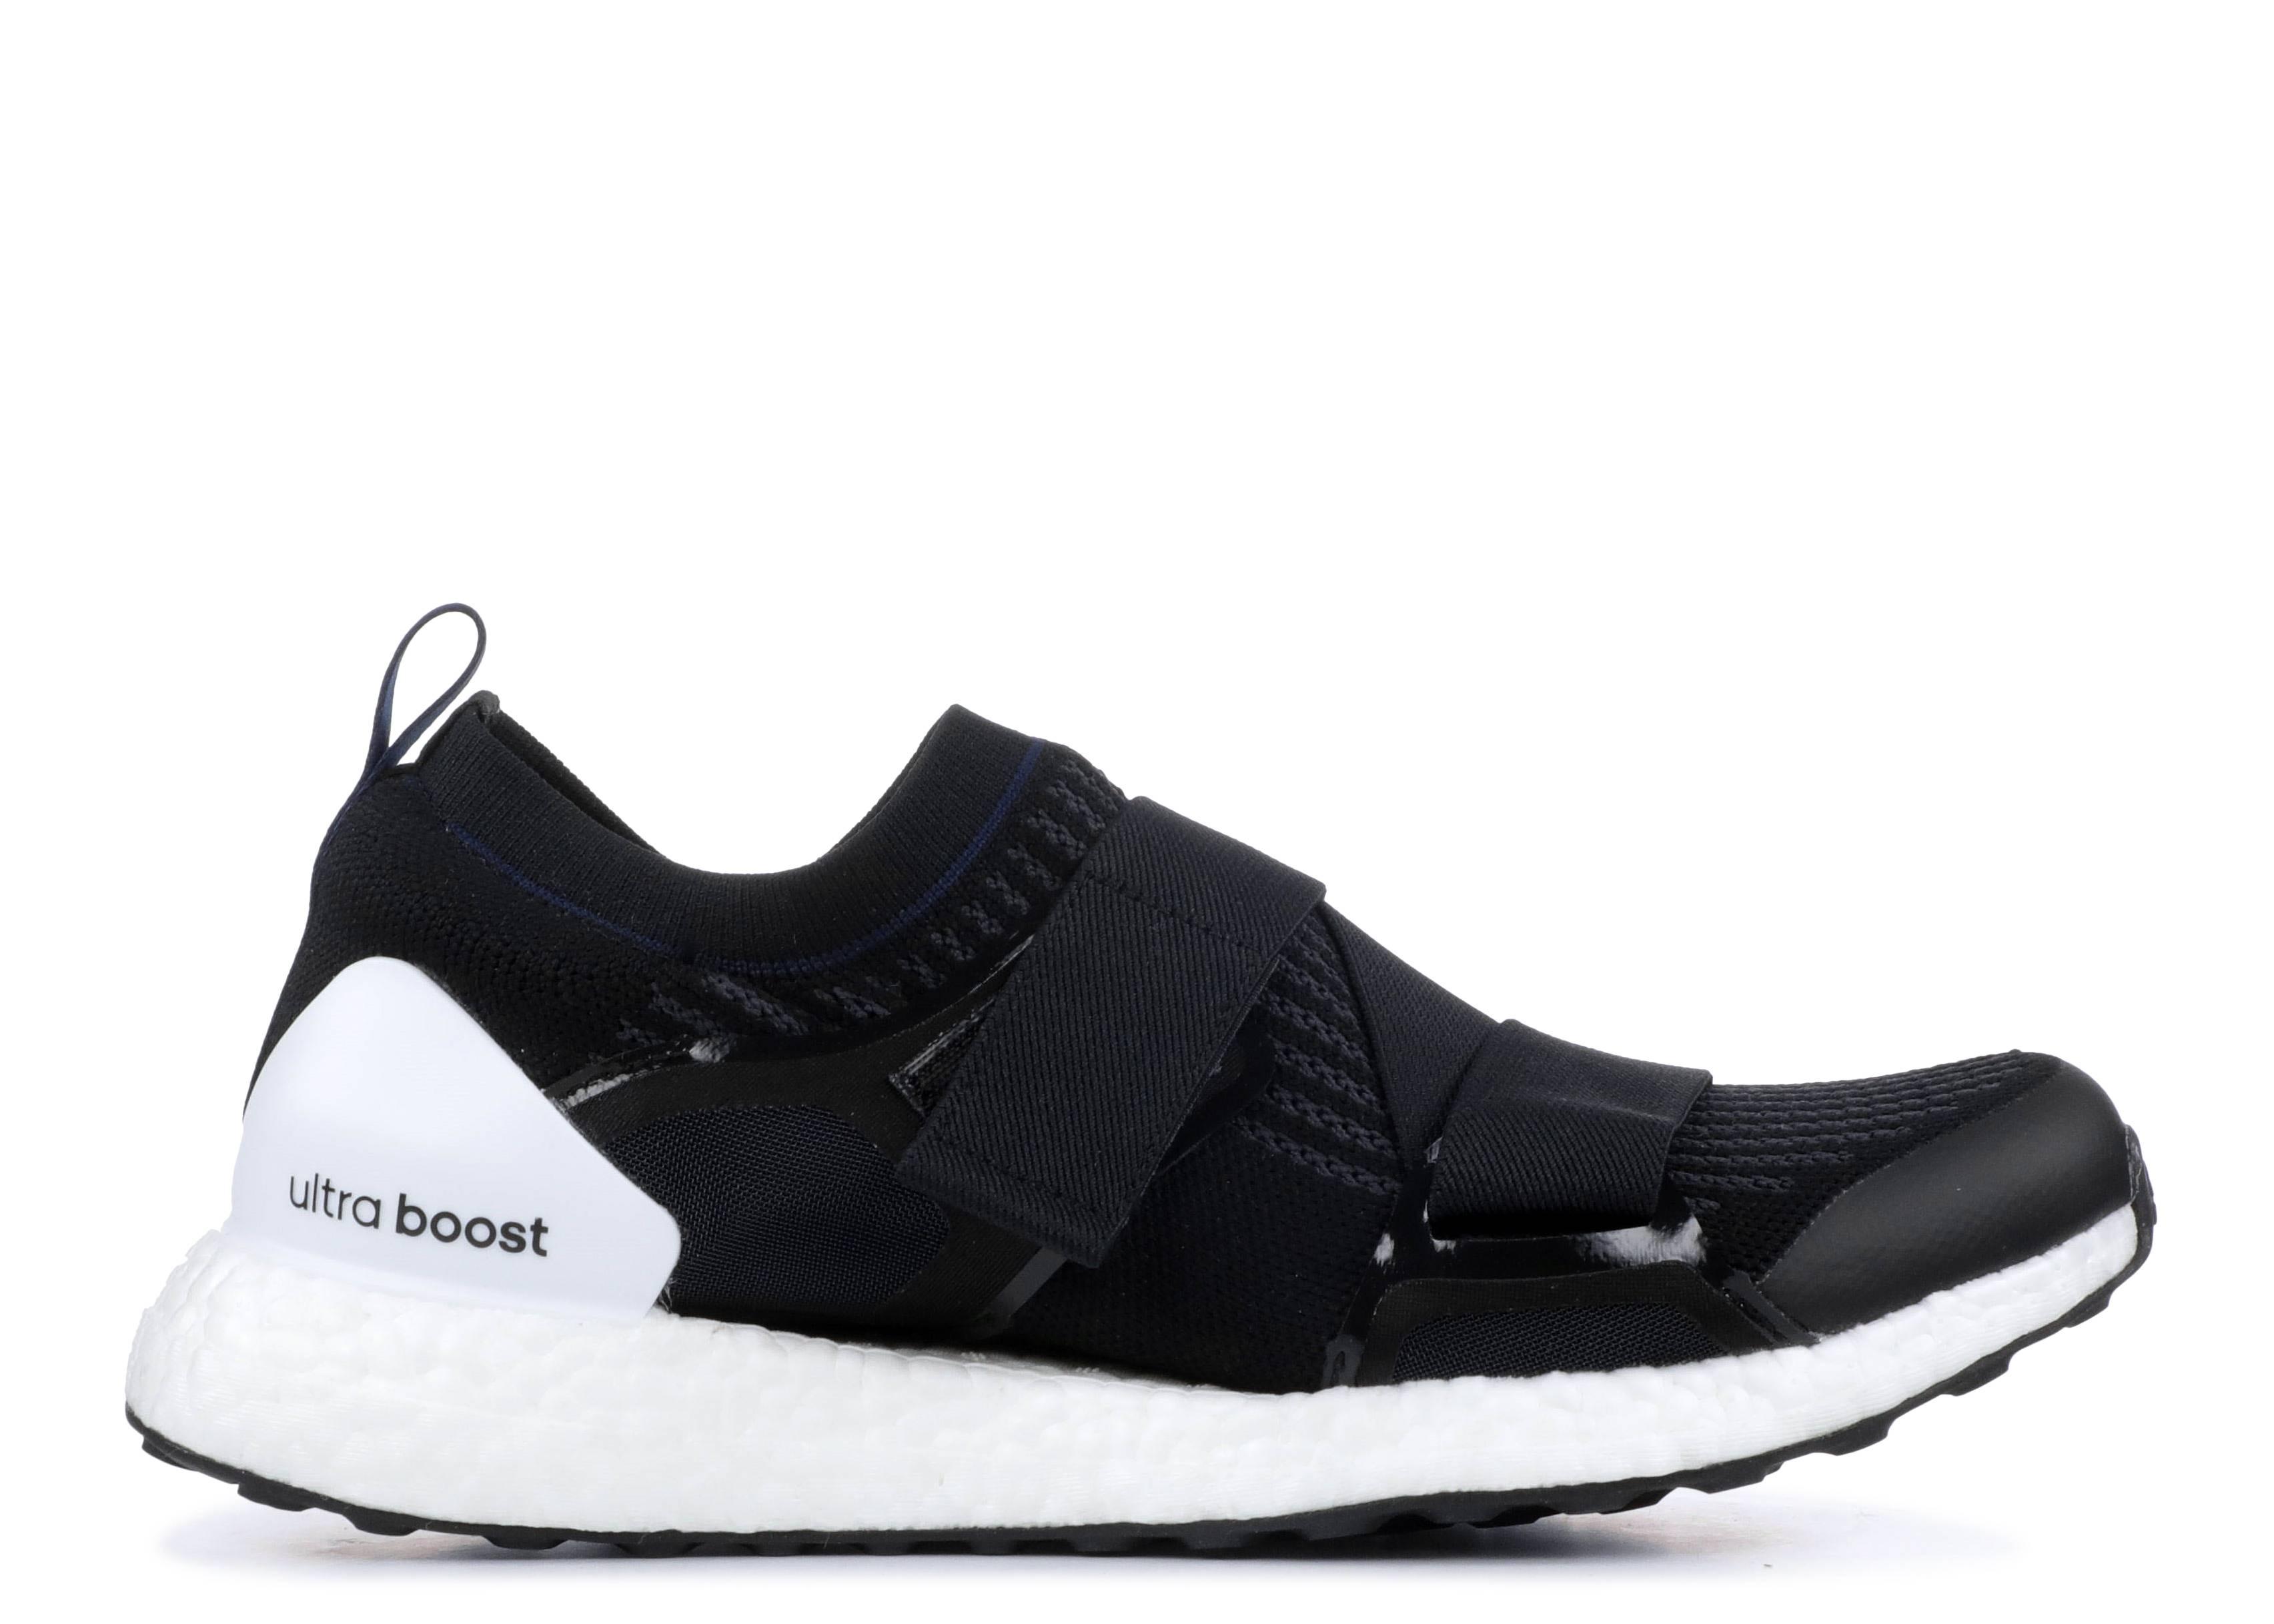 Neuer Stil Adidas ULTRA BOOST STELLA MCCARTNEY TRIPLE Weiß